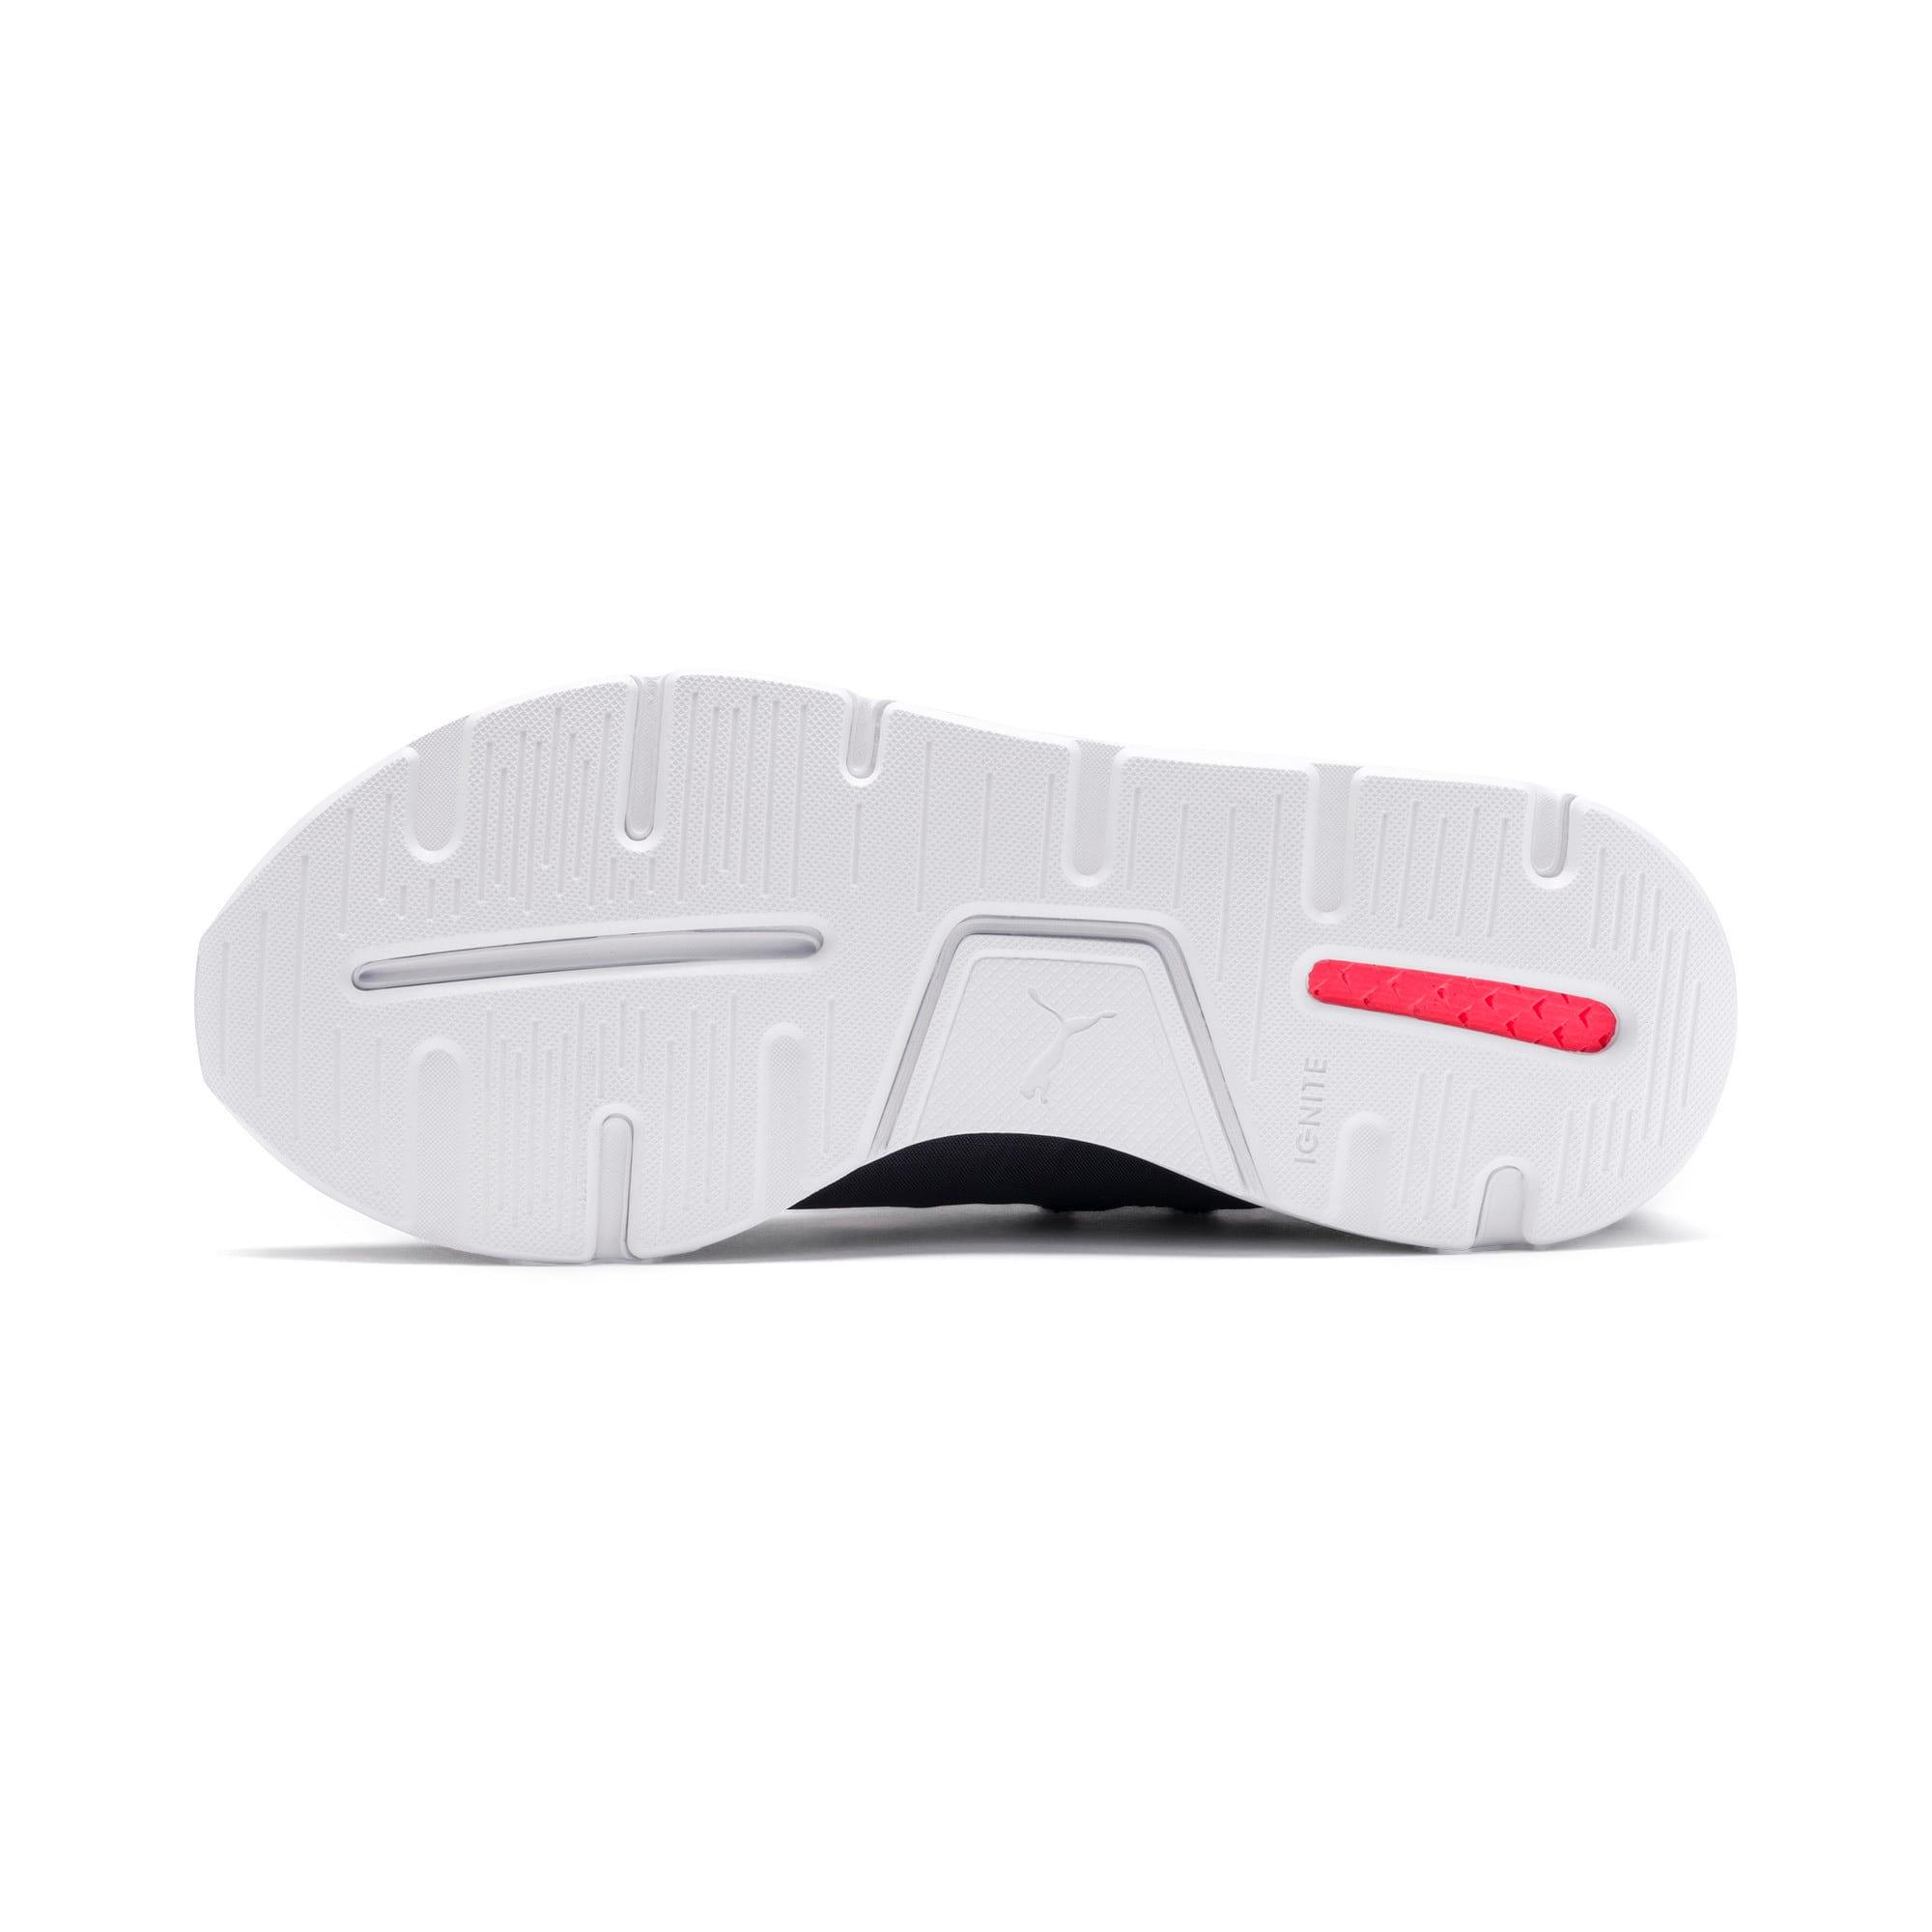 Thumbnail 5 of Muse 2 Hypertech Women's Sneakers, Puma Black-Sulphur, medium